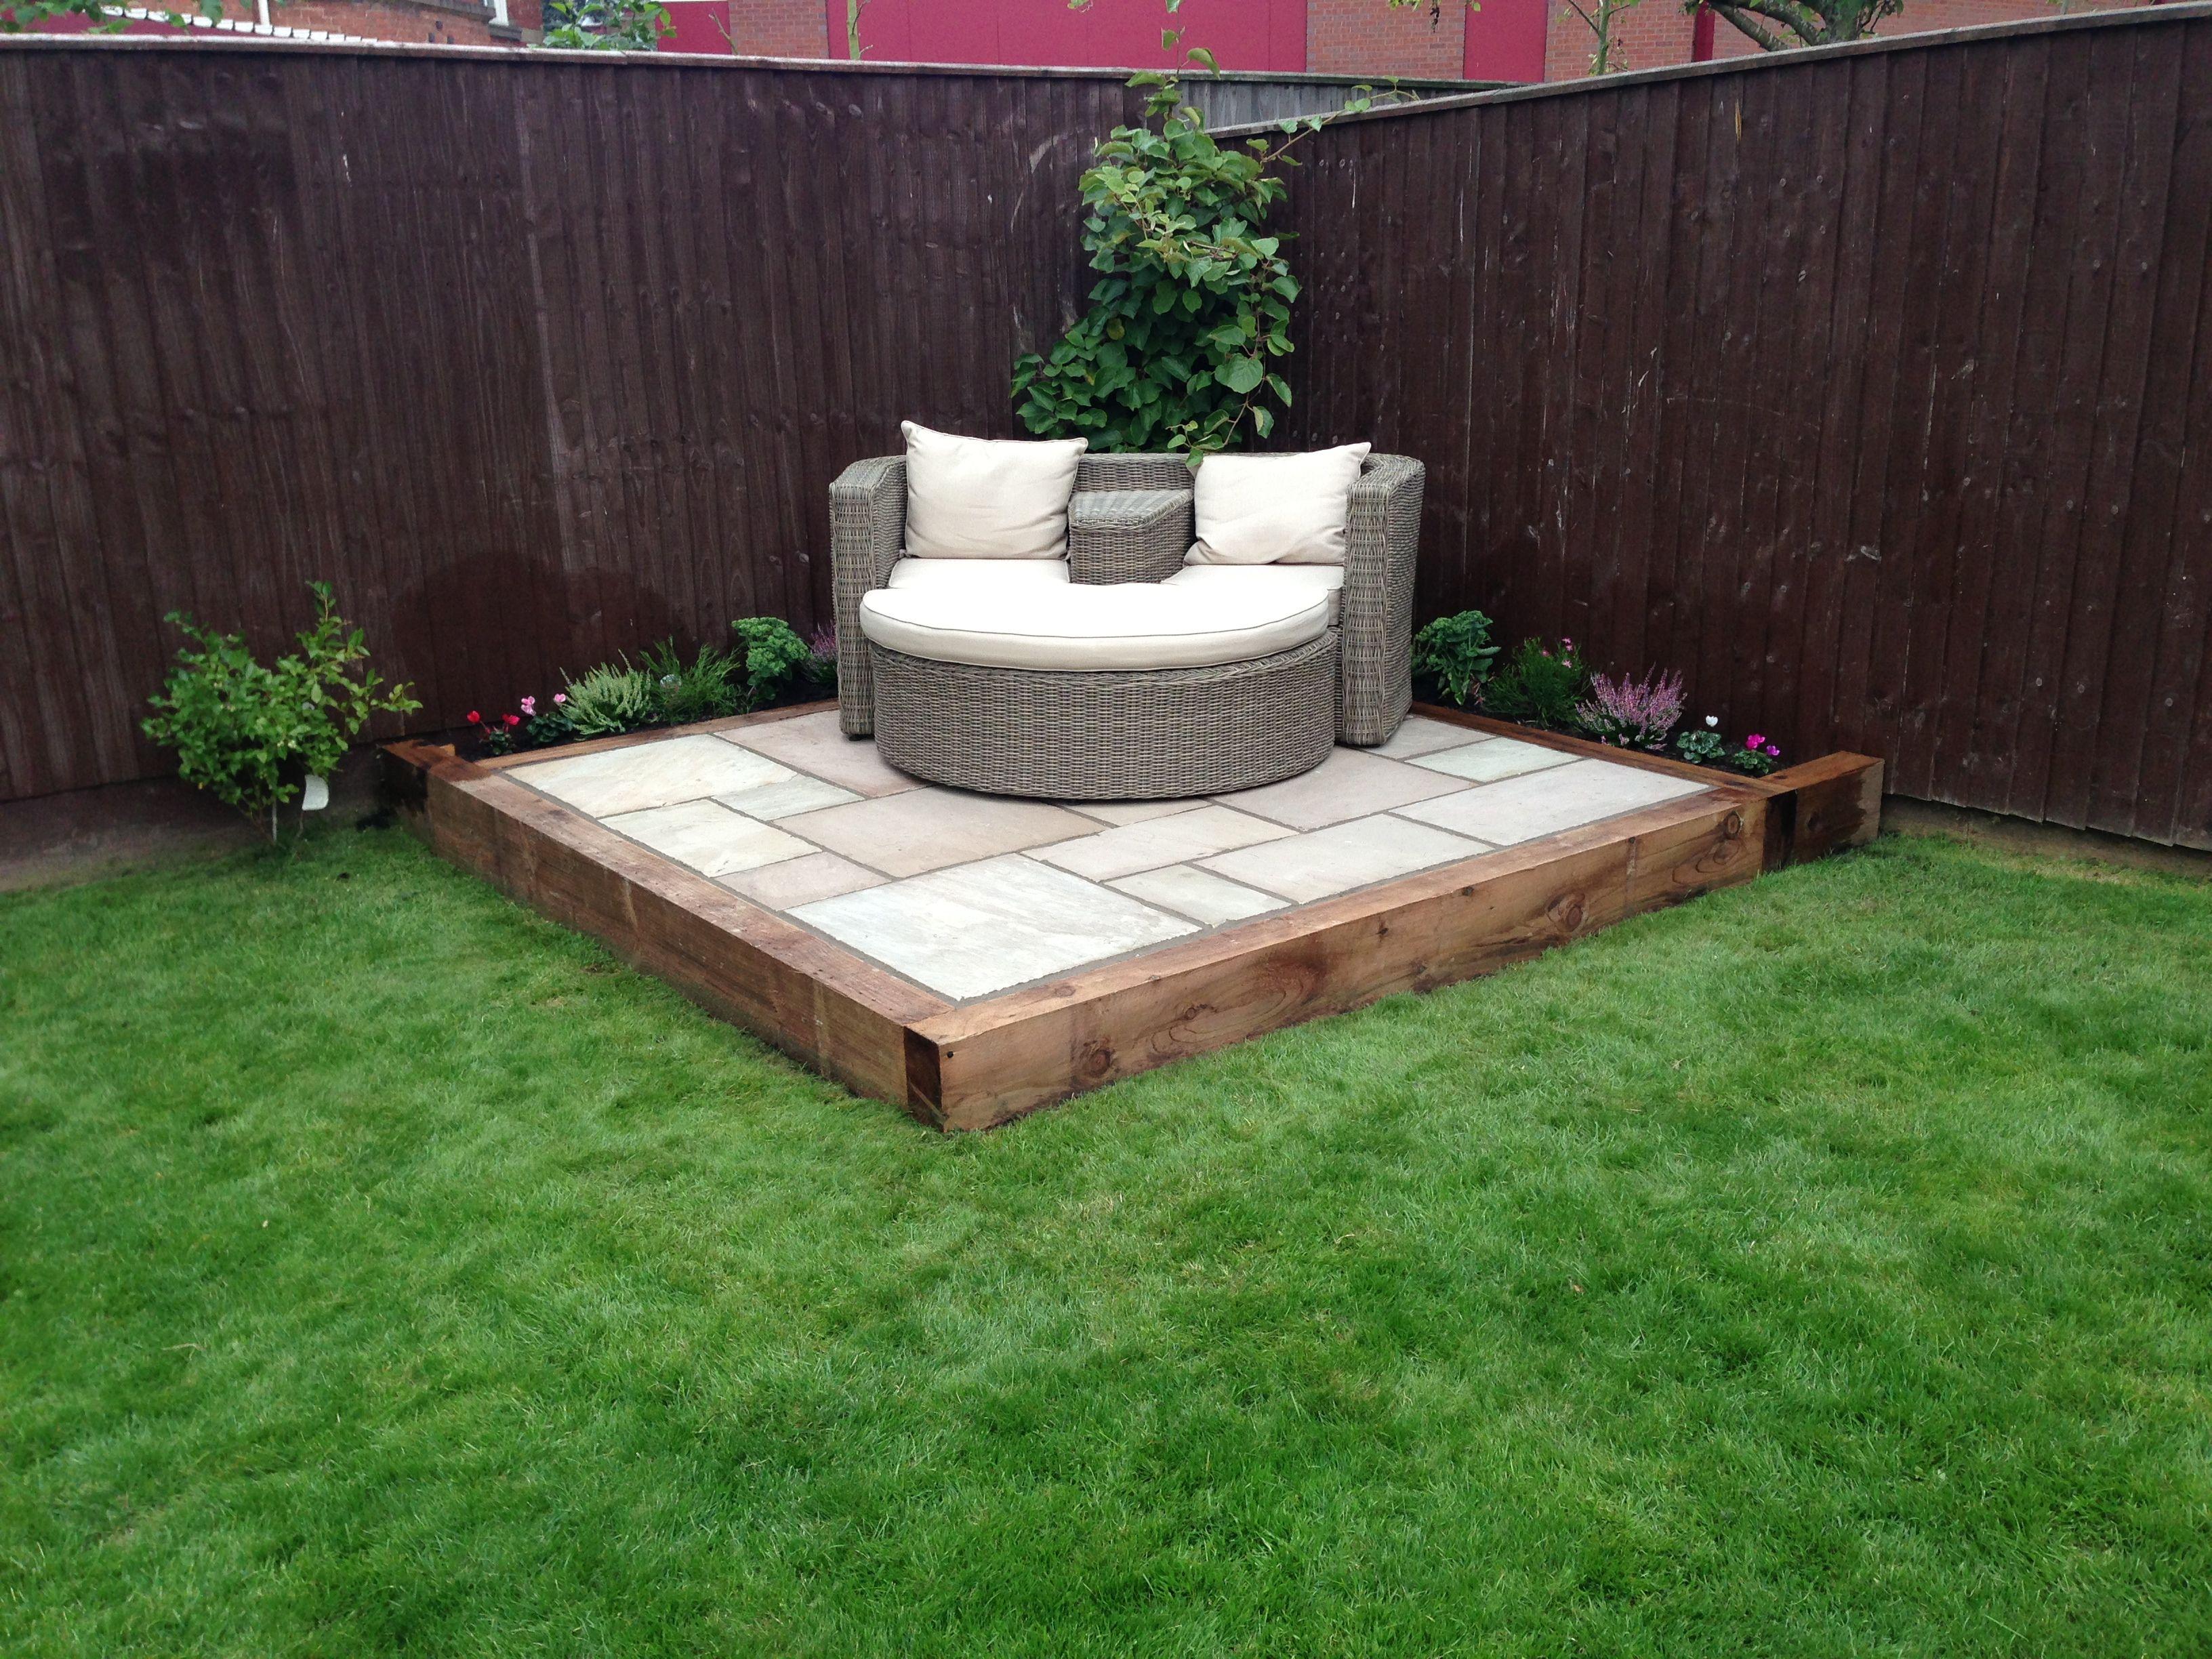 small garden patio using wooden sleepers perfect sun spot